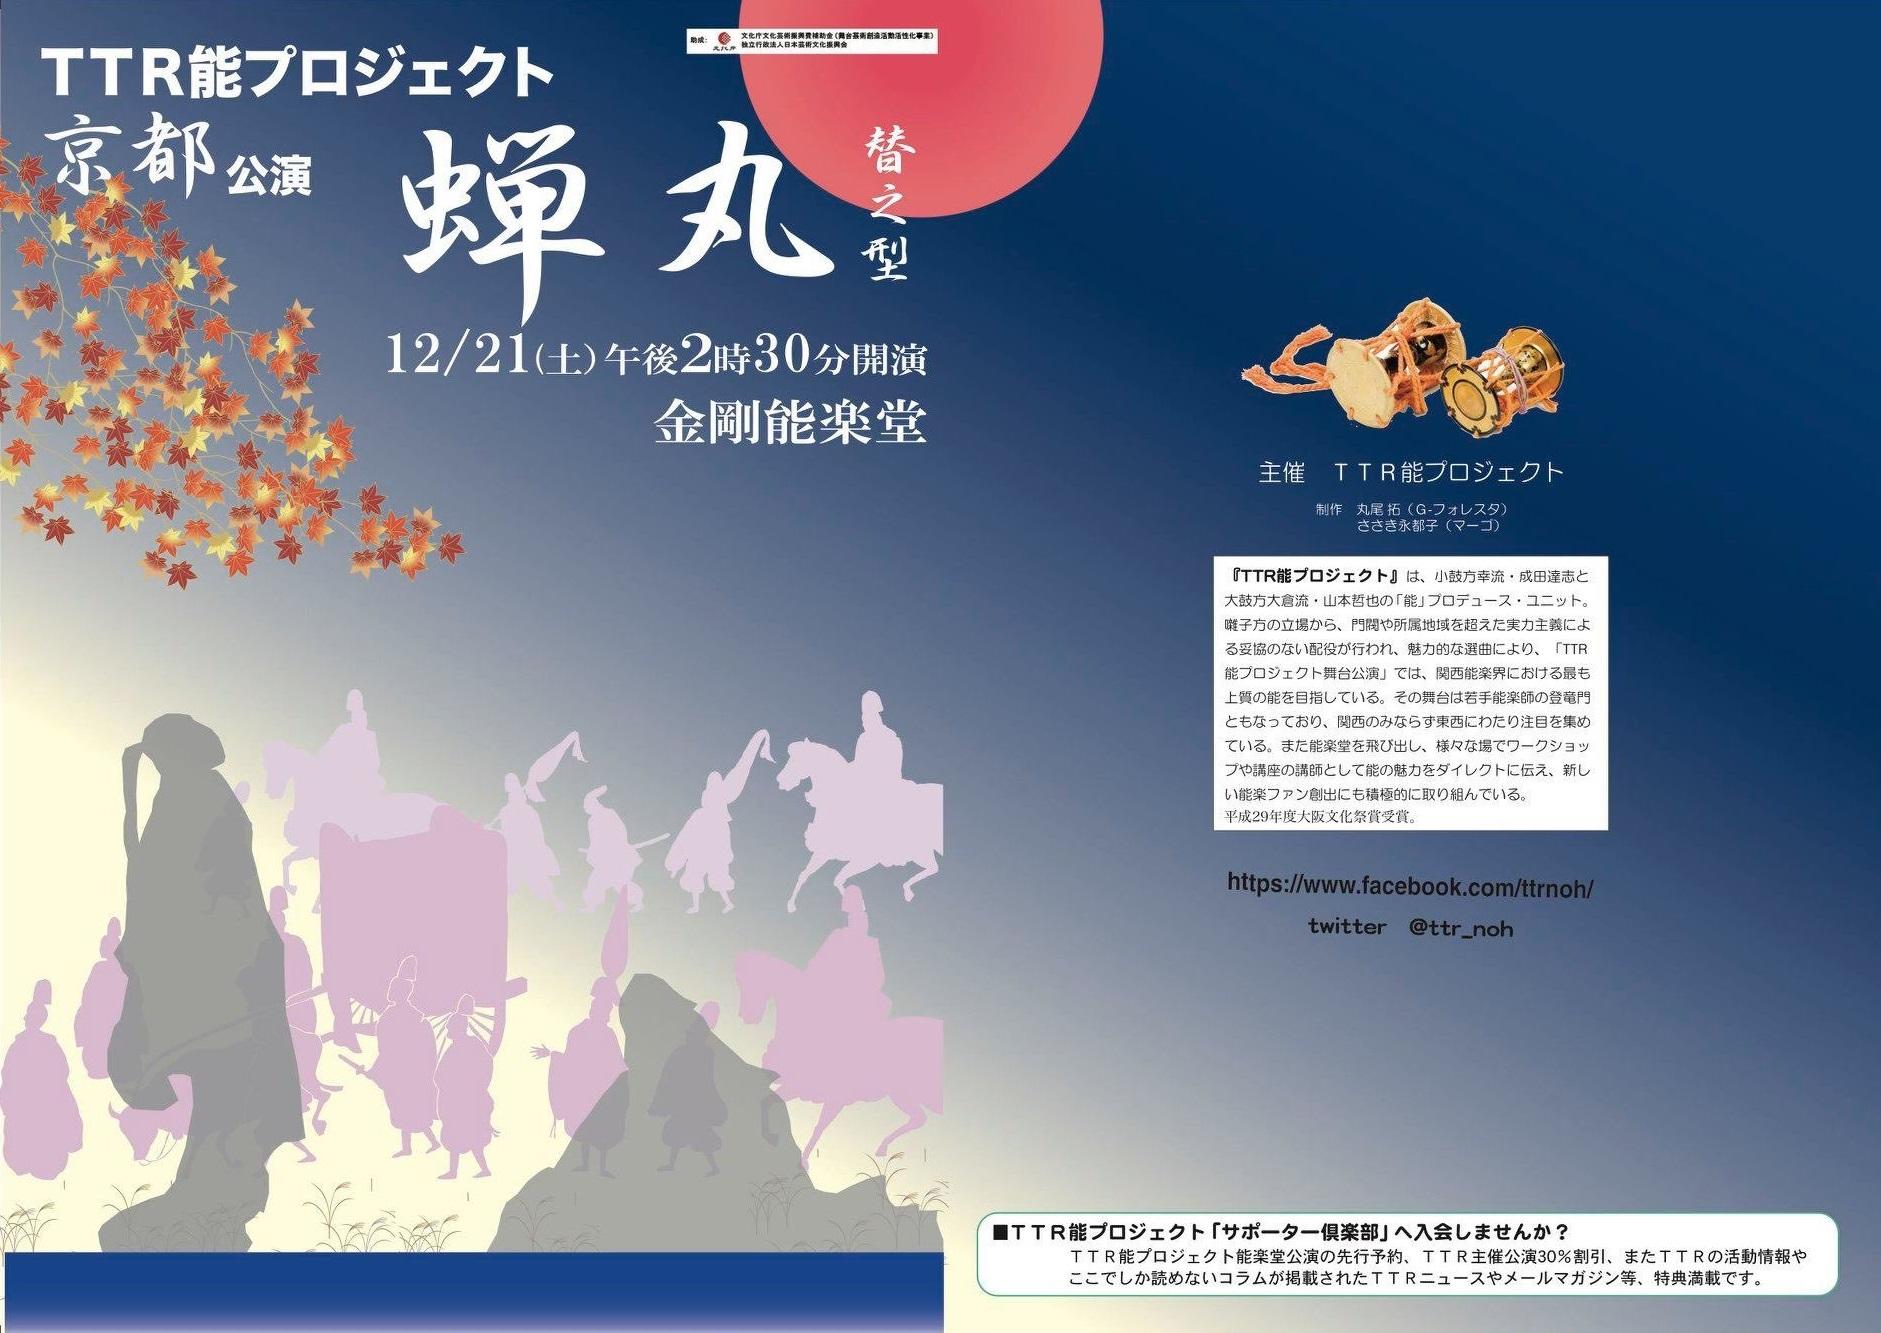 TTR能プロジェクト京都公演《蝉丸》